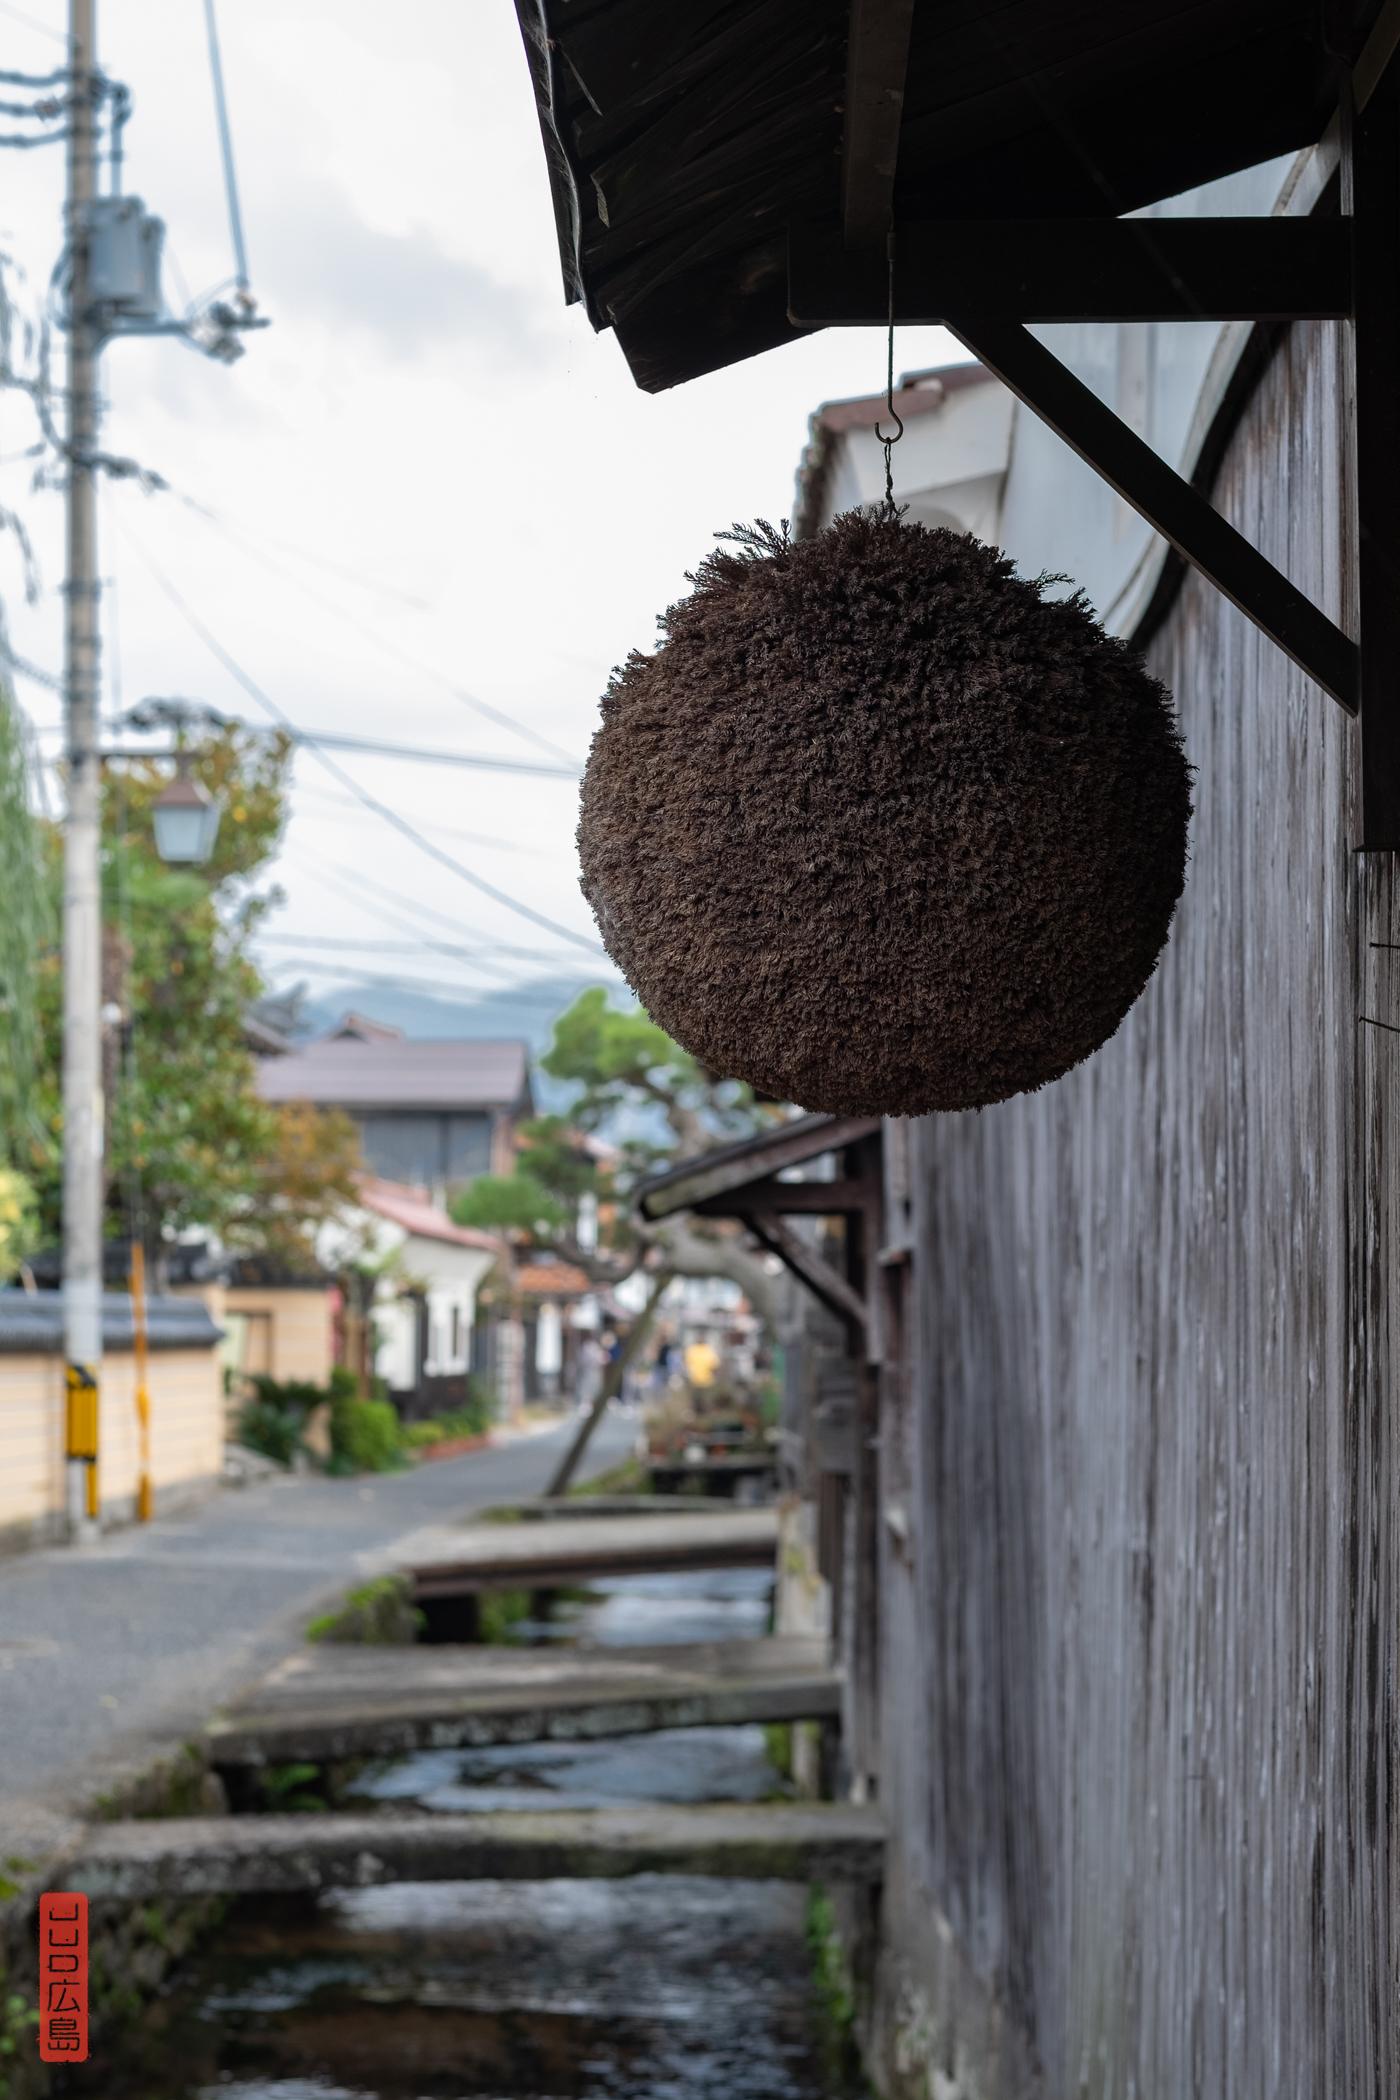 杉玉 (sugidama - boule de branches de cèdre)